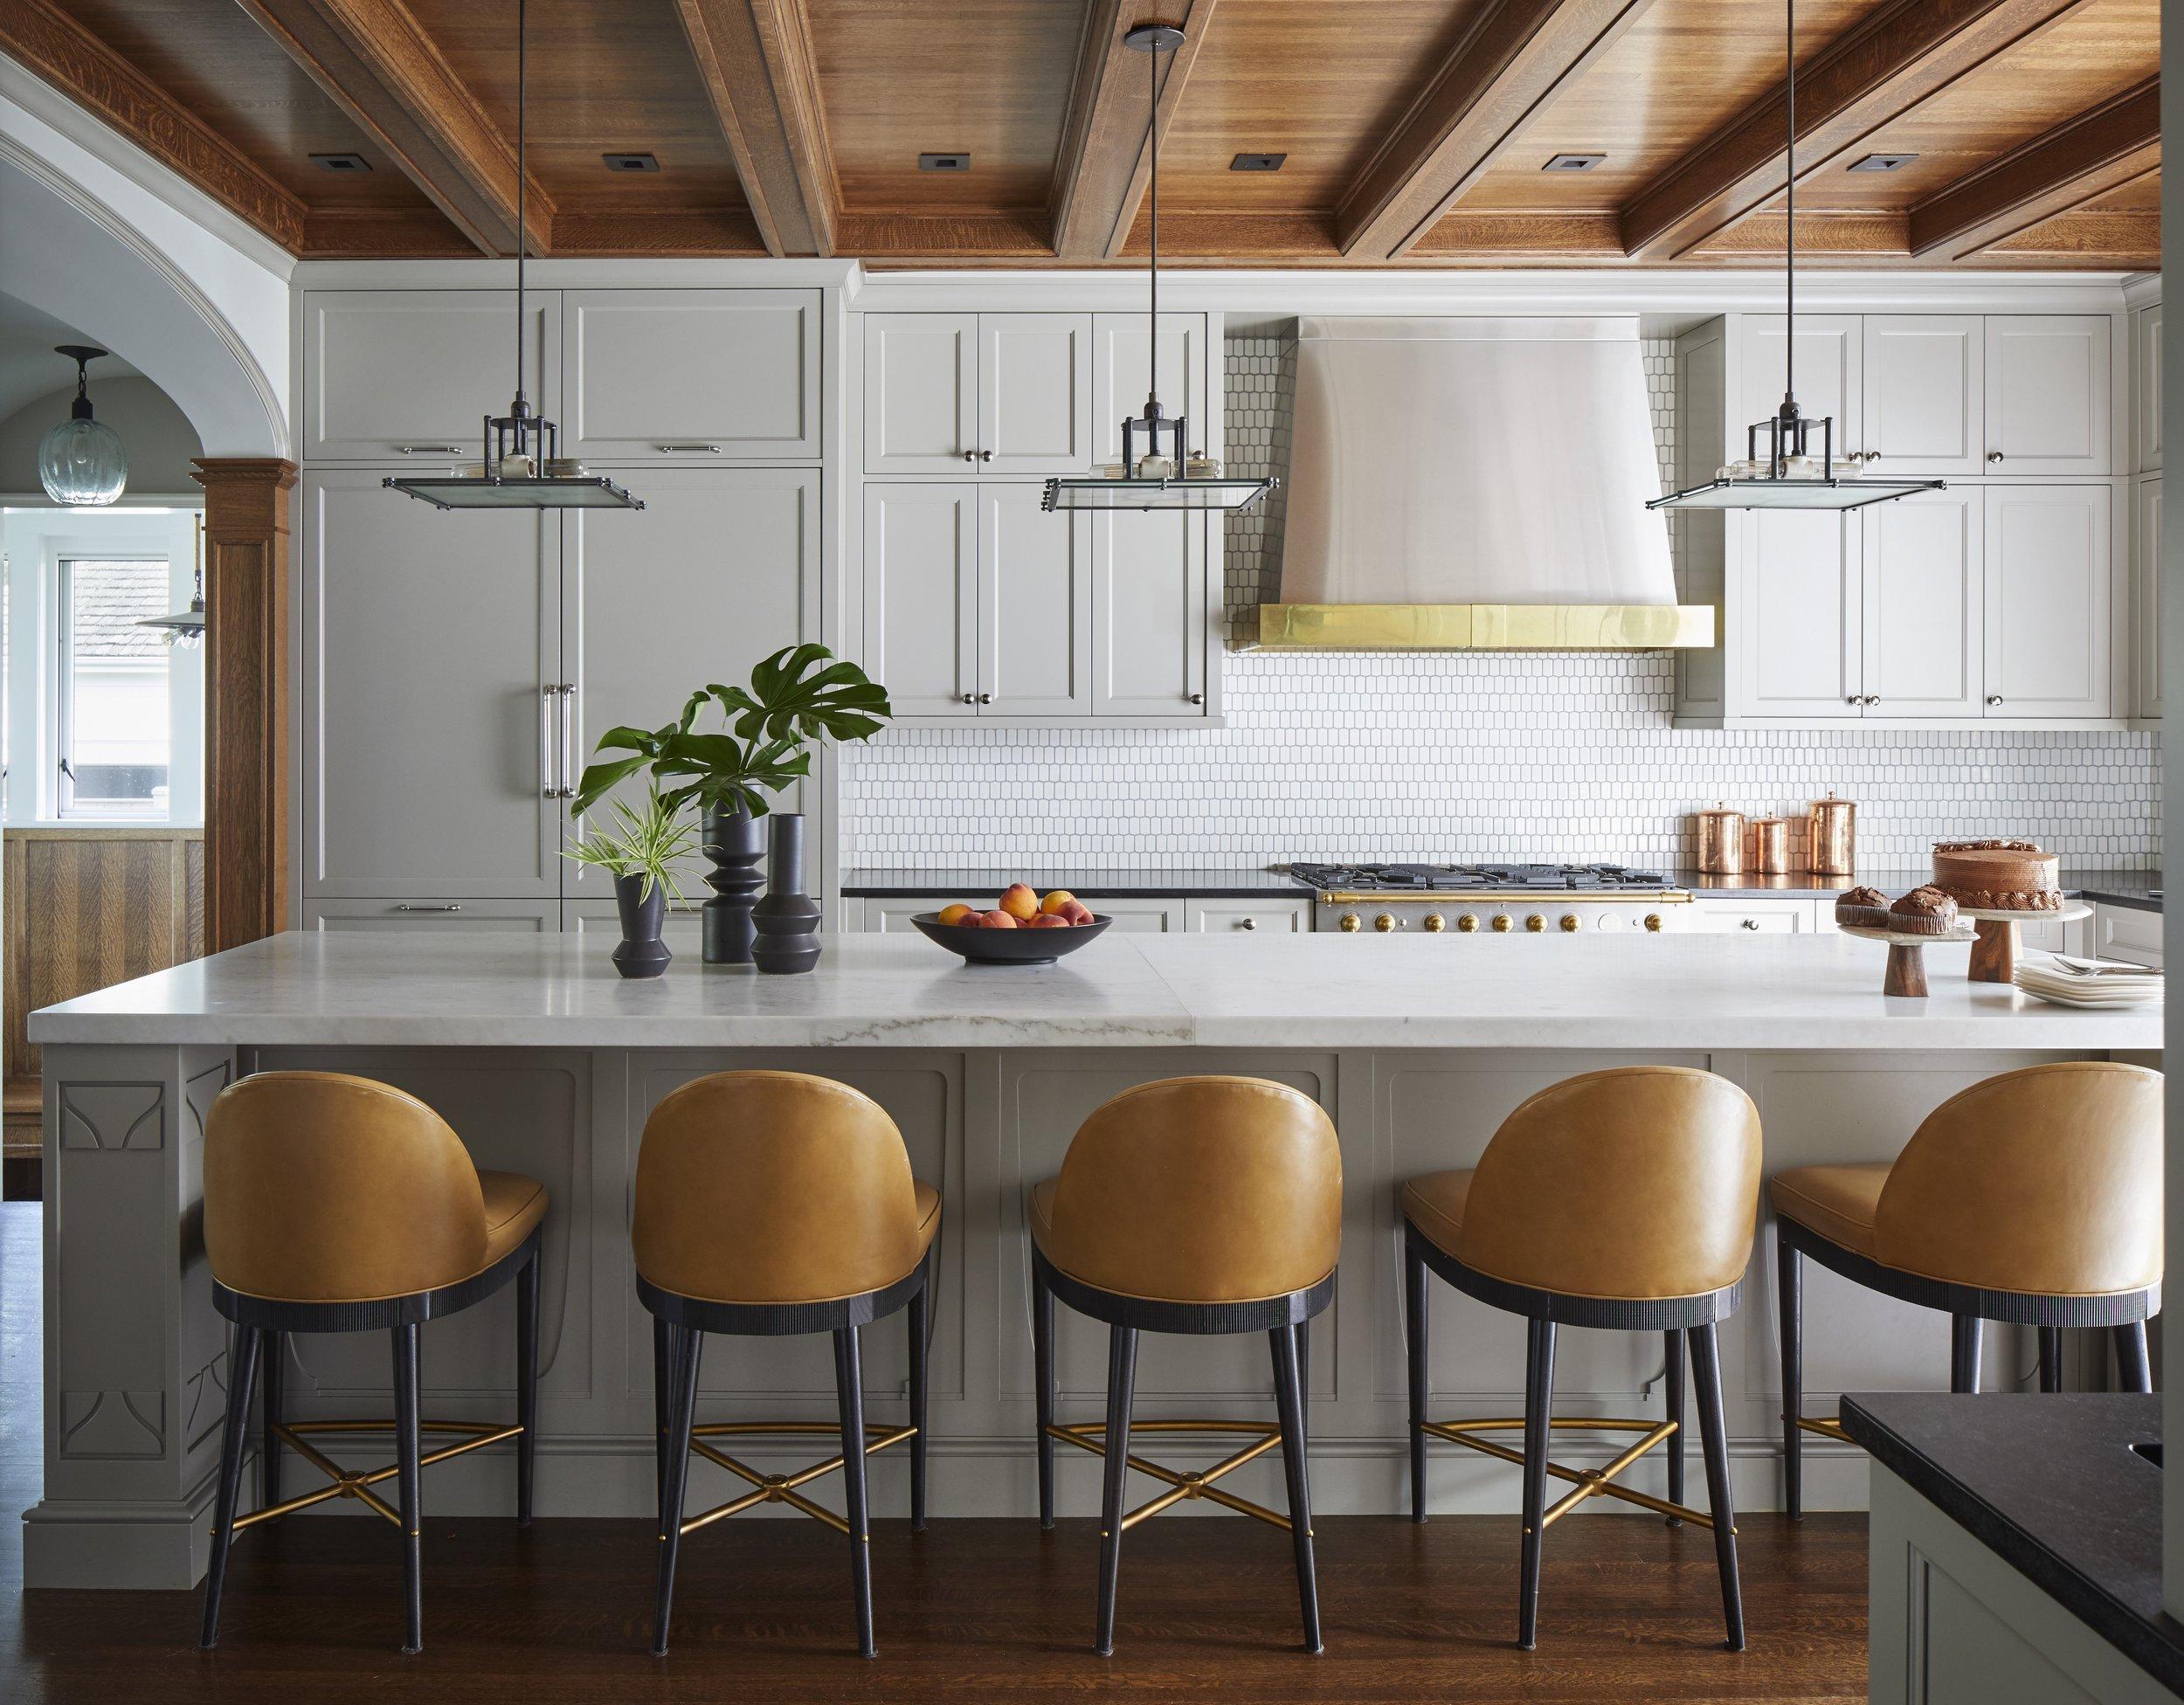 counter-height-stool-kitchen-design